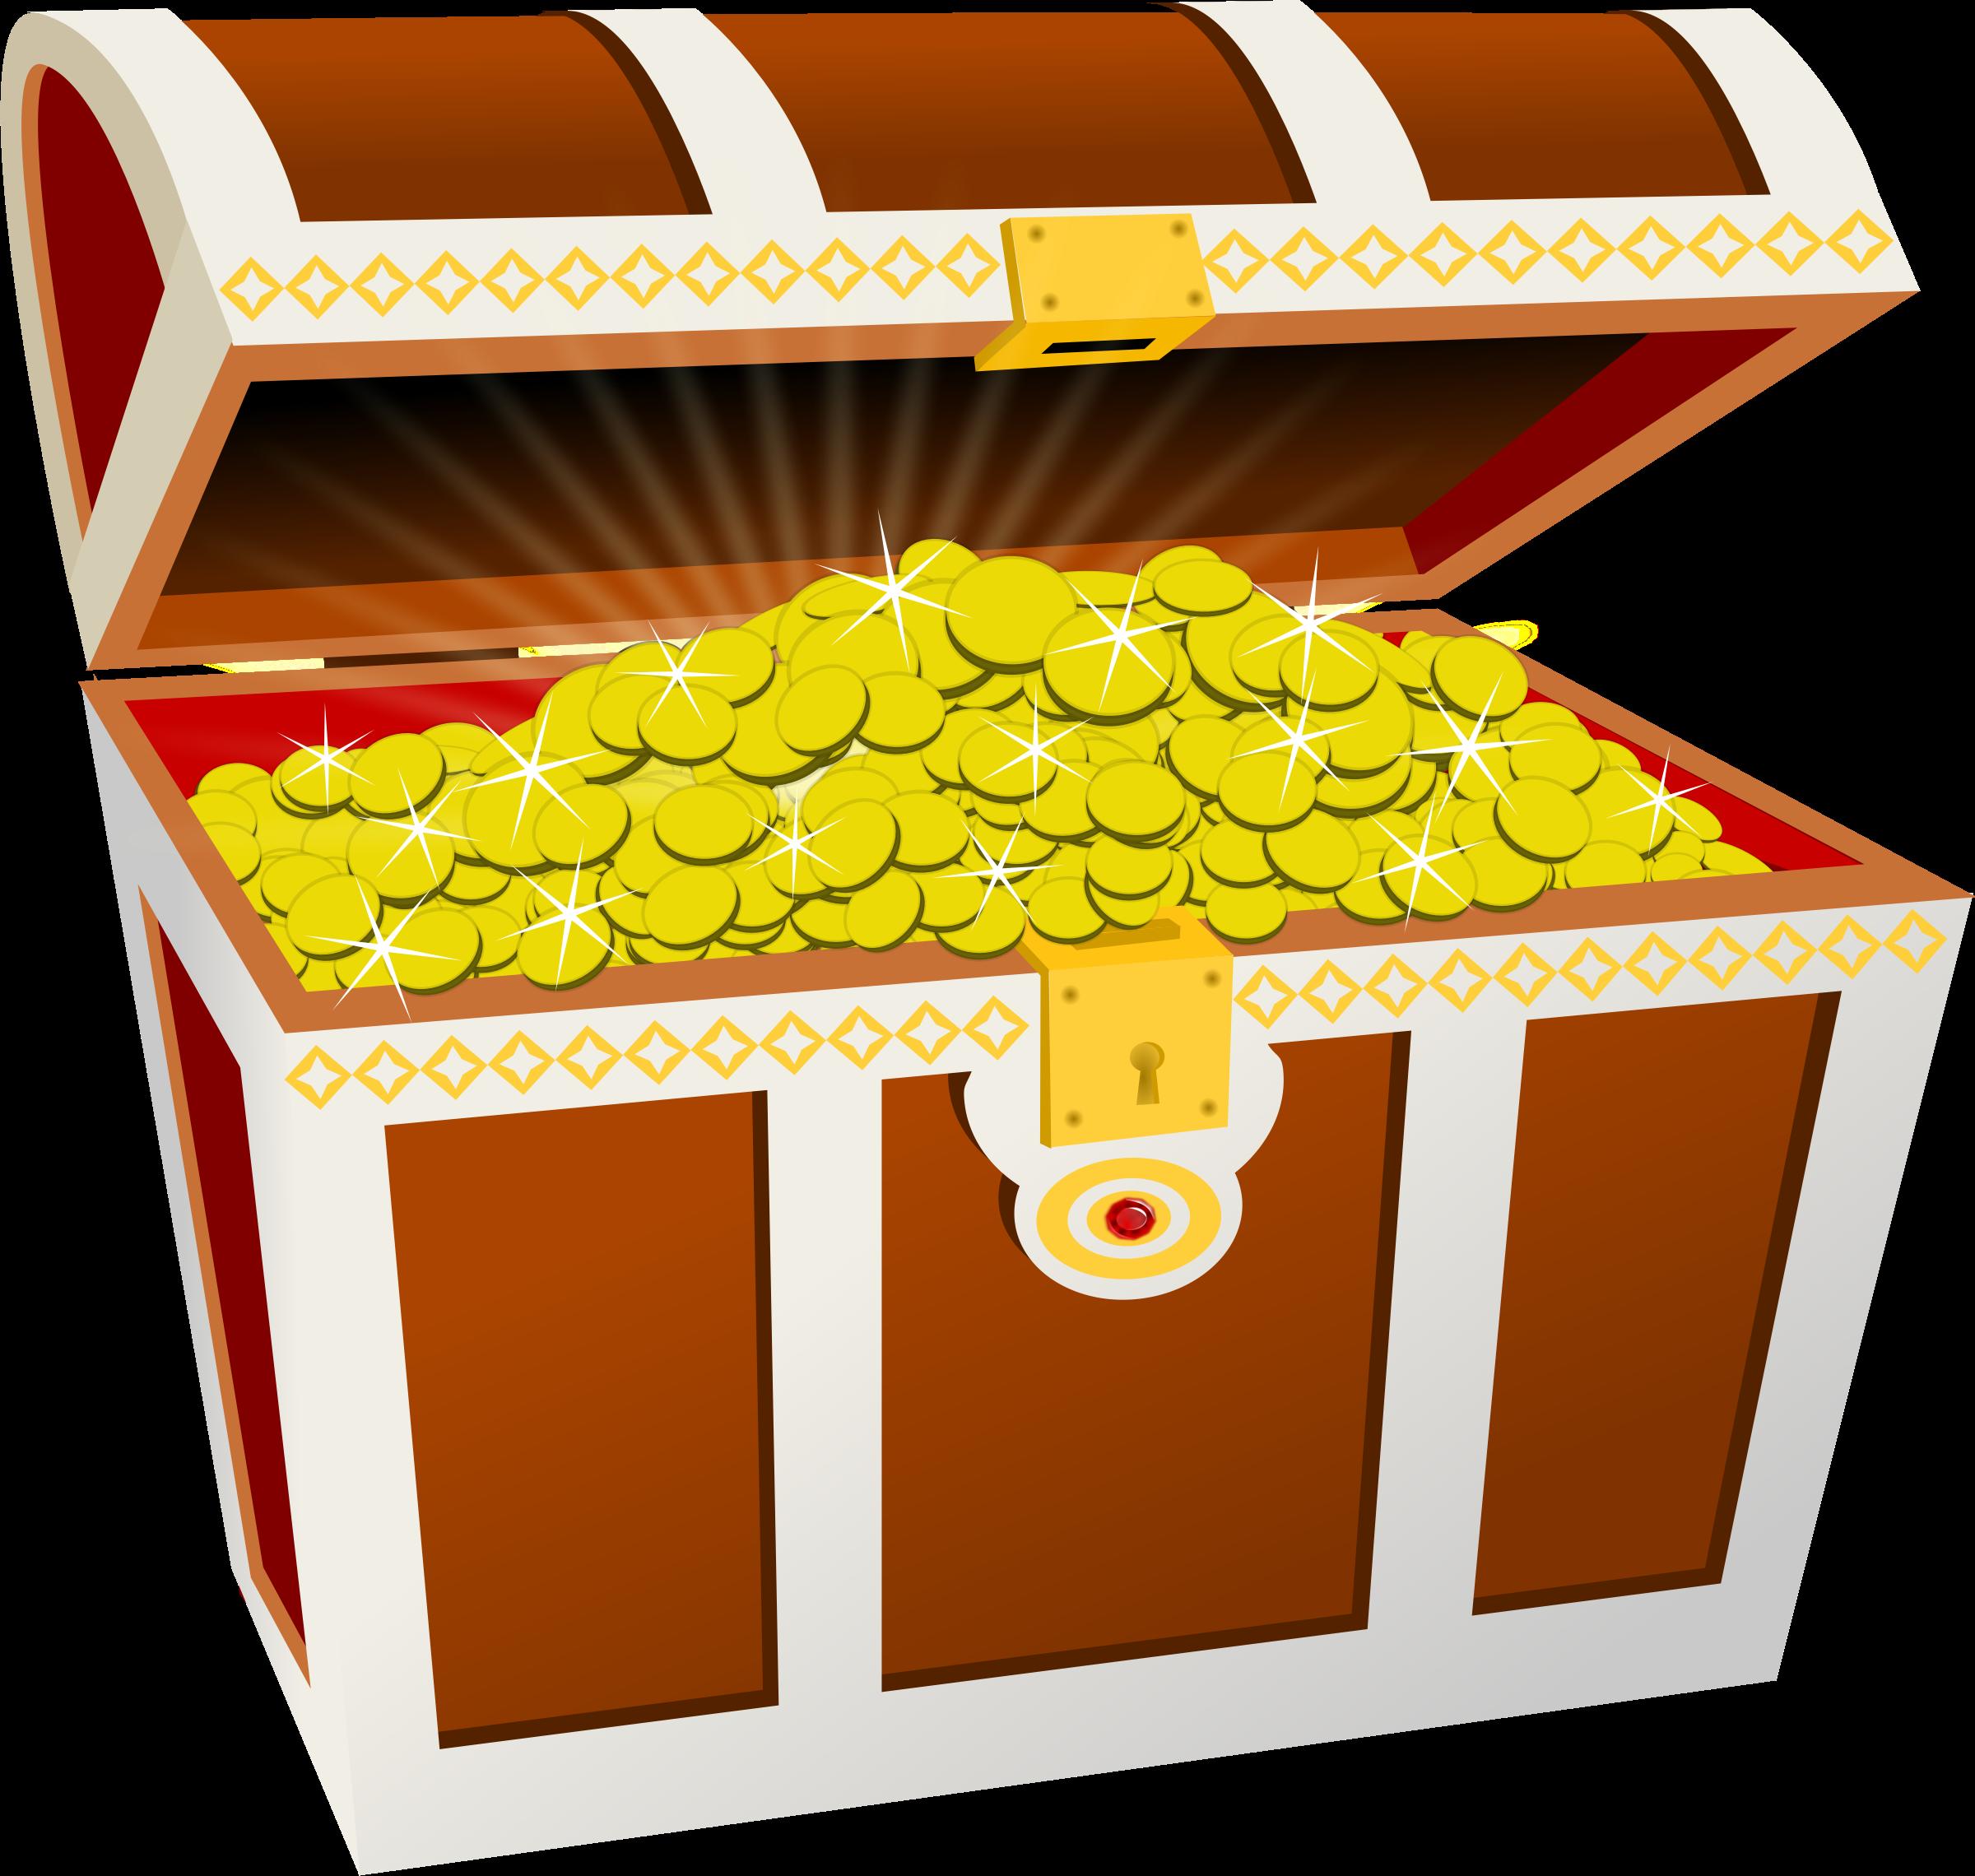 Treasure Chest Clip Art Image ... BIG IM-Treasure Chest Clip Art Image ... BIG IMAGE (PNG)-10